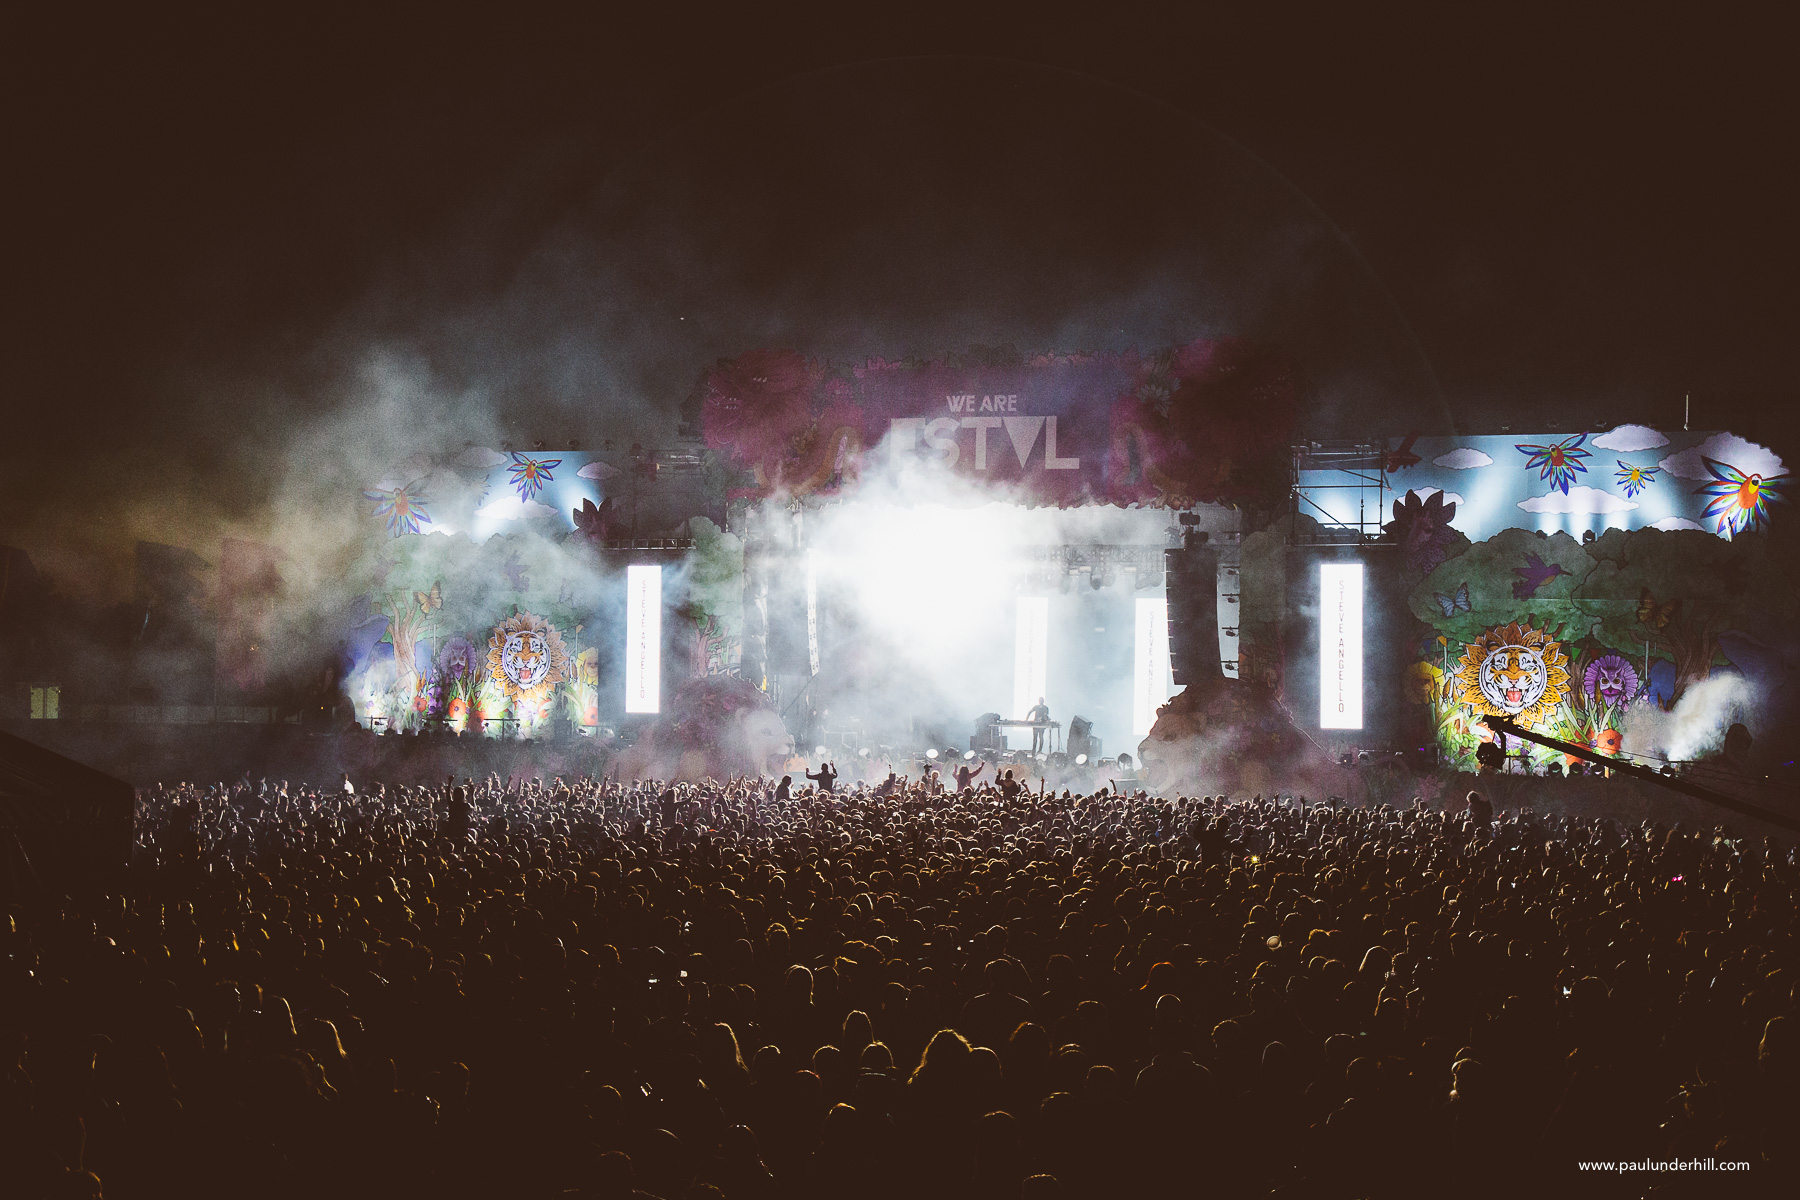 Festival-documentary-photographer-00006